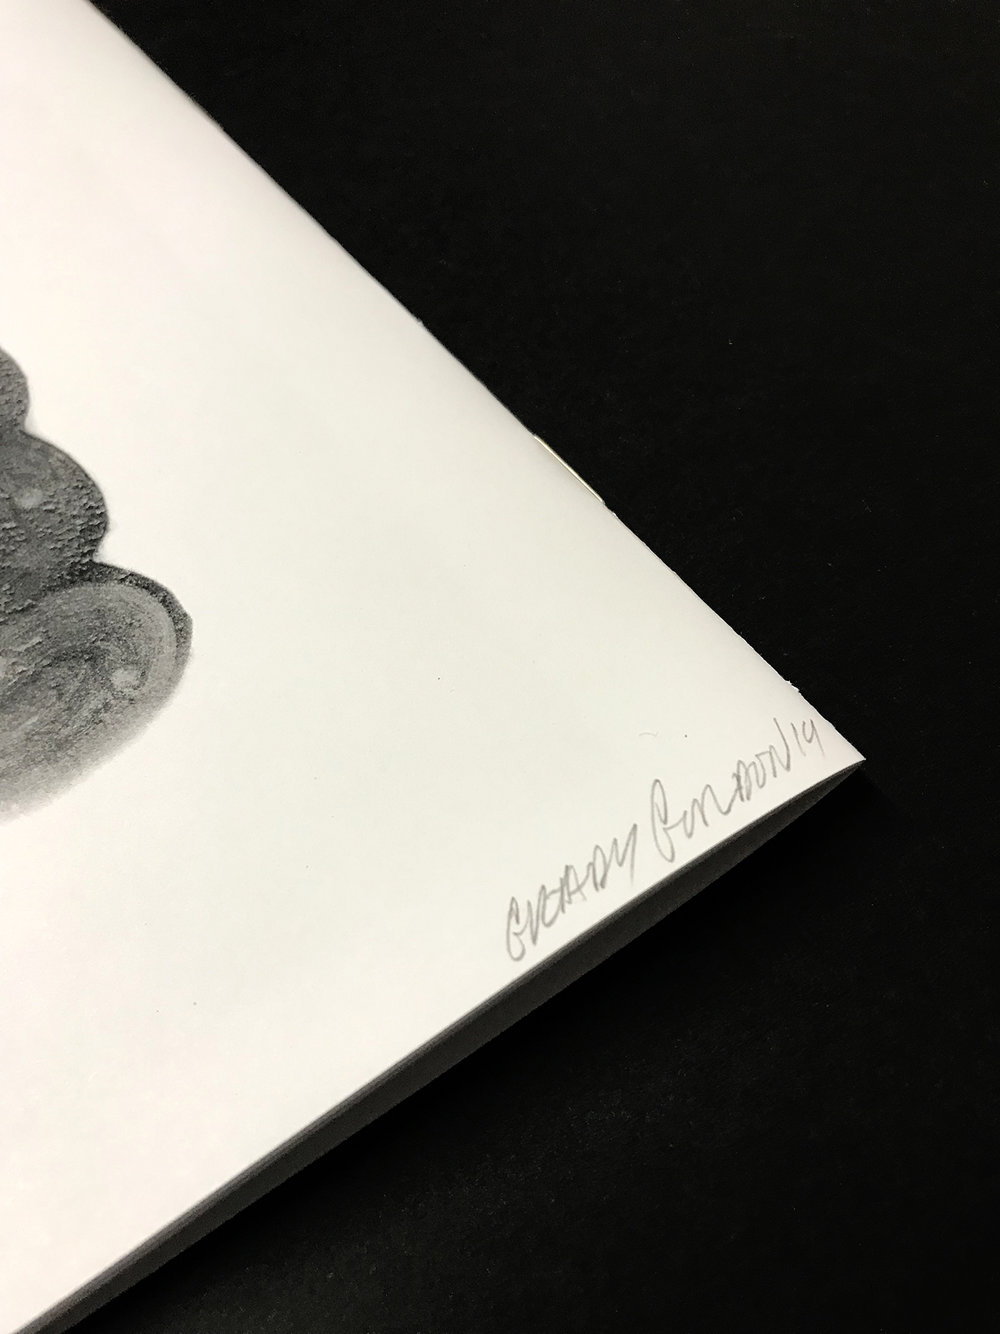 Grady Gordon monotype printing